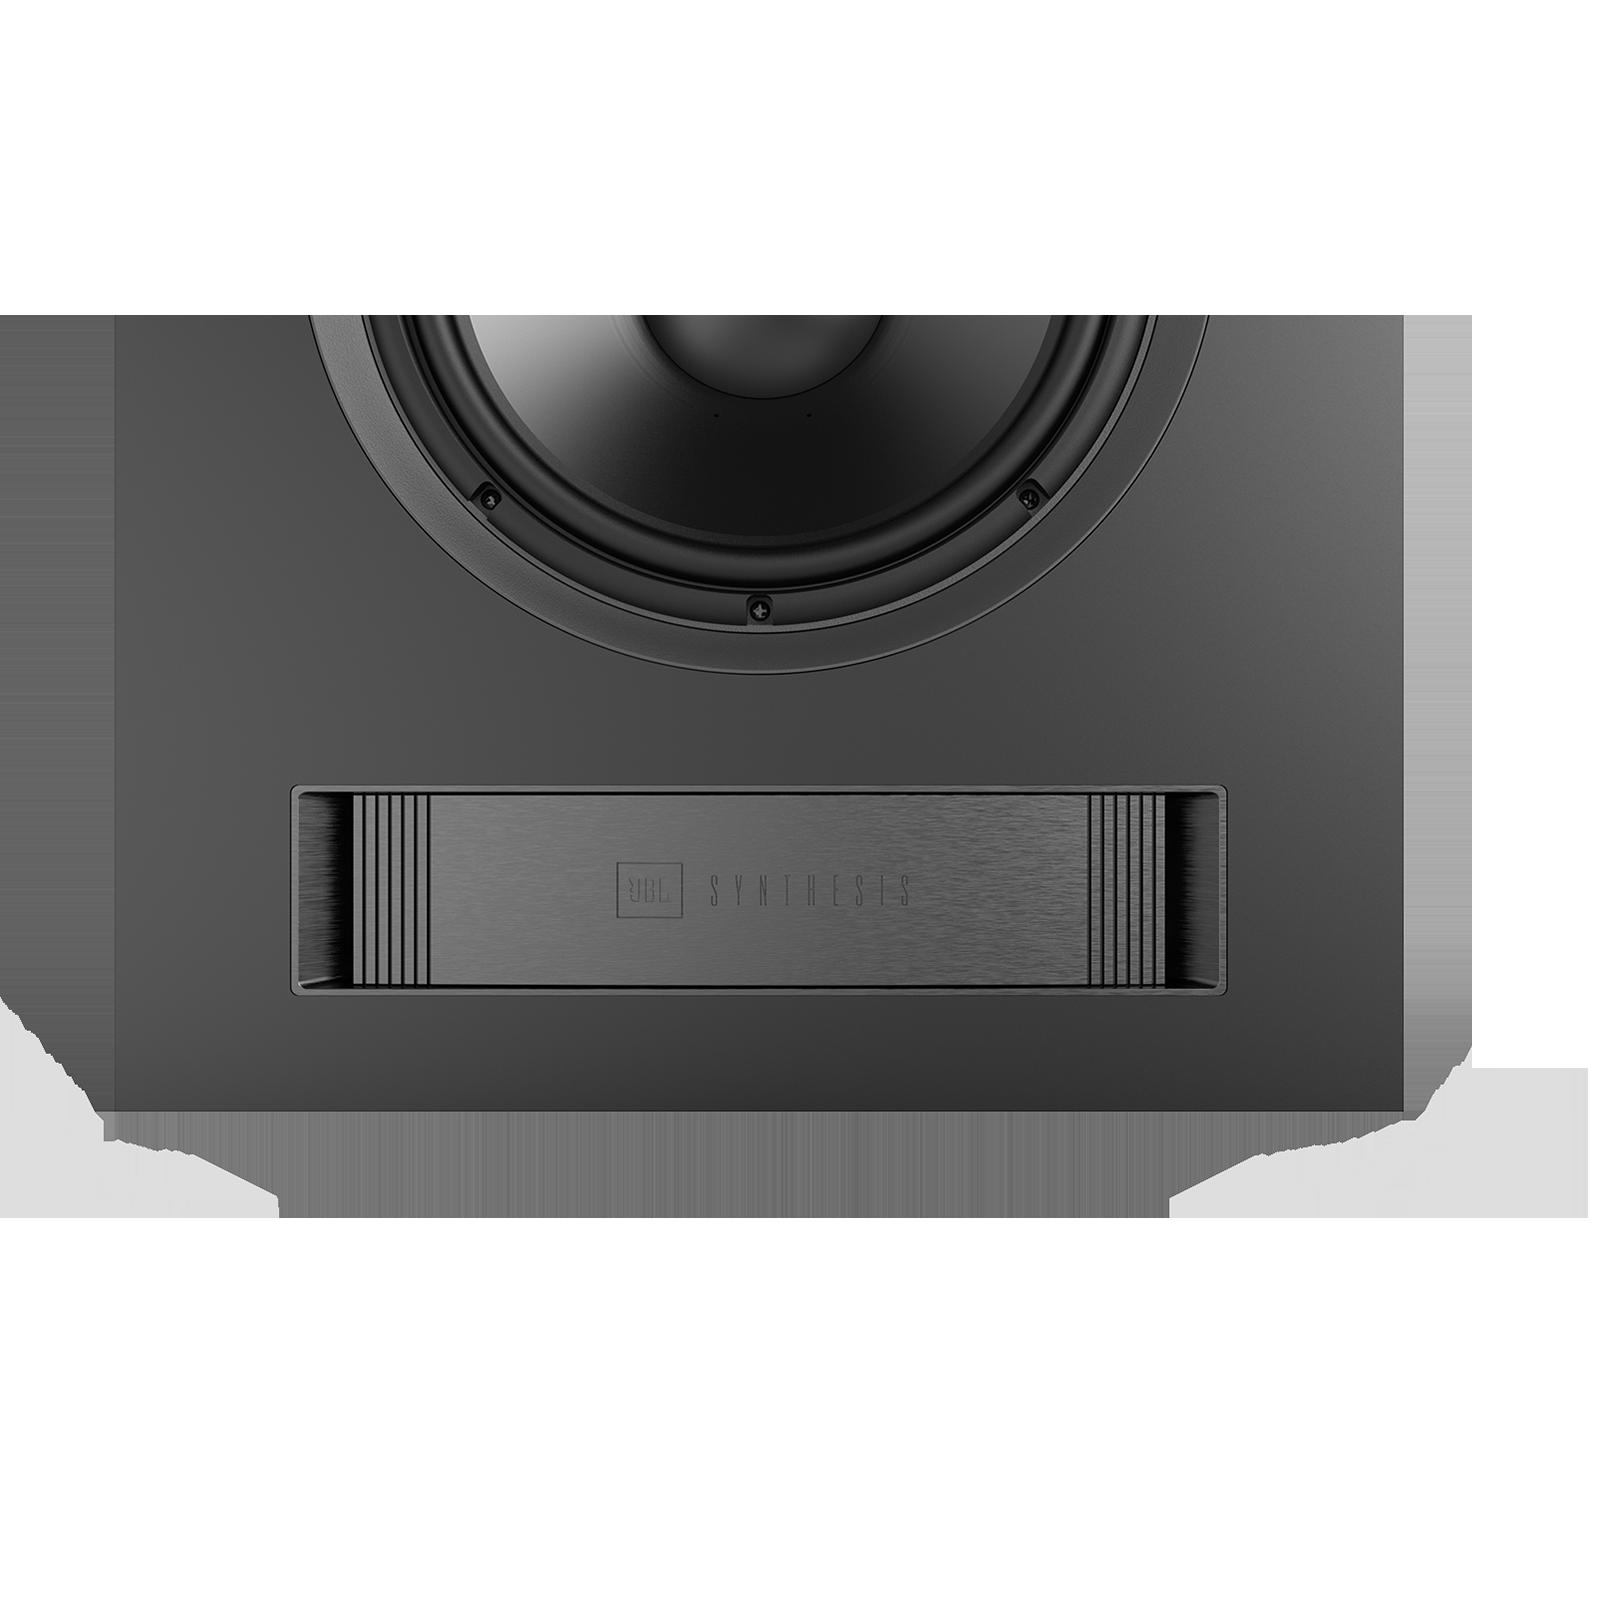 SCL-1 - Black - 2-Way Dual 12-inch (300mm) Custom LCR Loudspeaker - Detailshot 6